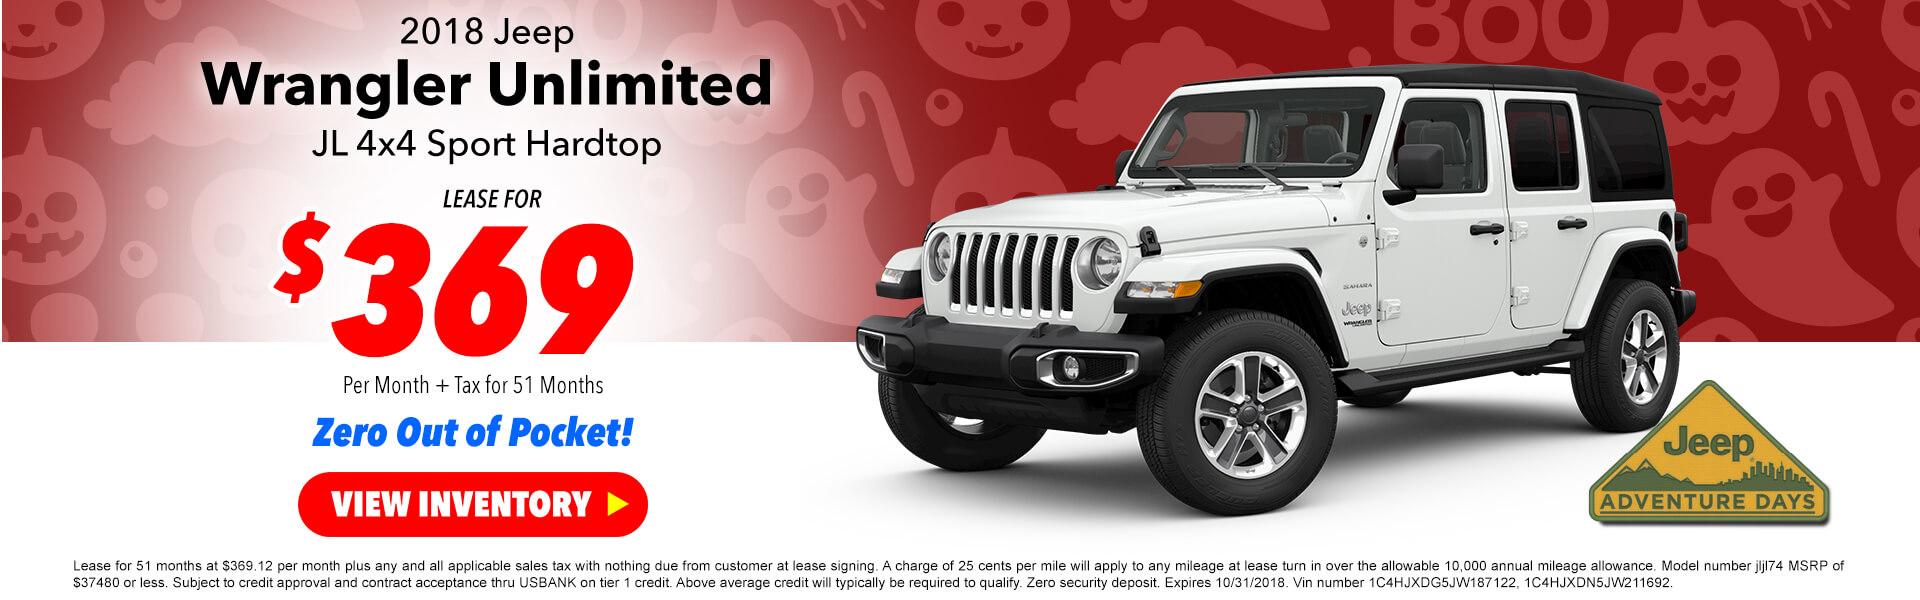 Los Angeles CDJR. Dodge Durango. Jeep Wrangler